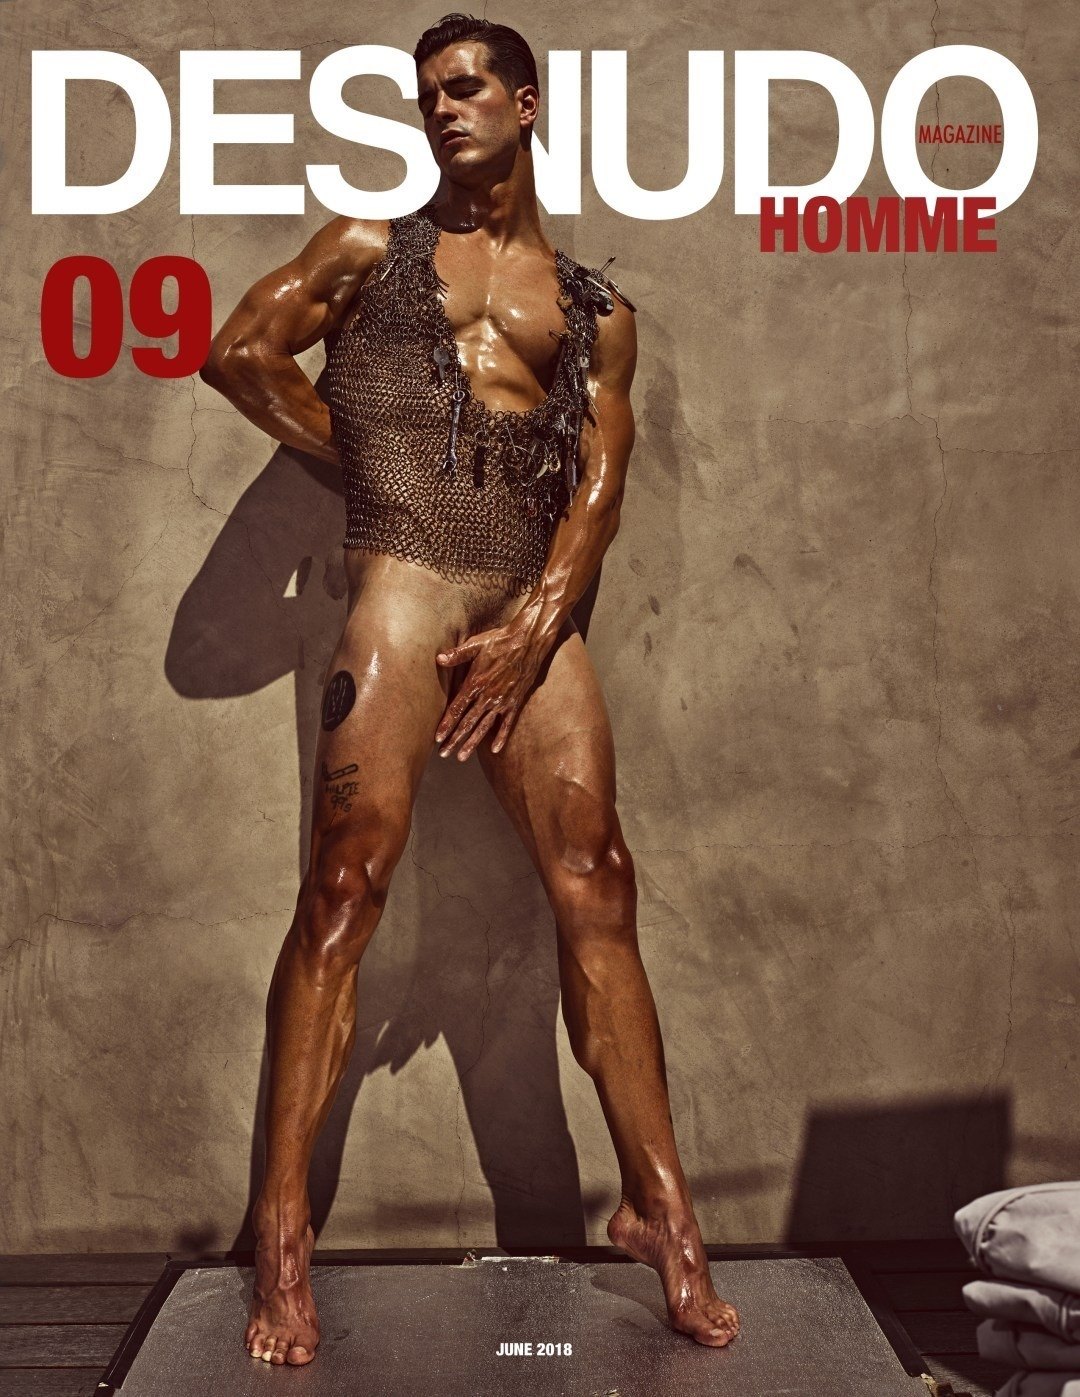 Andrea García Al Desnudo desnudo-magazine-andrew-biernat-by-brian-kaminski.-summer